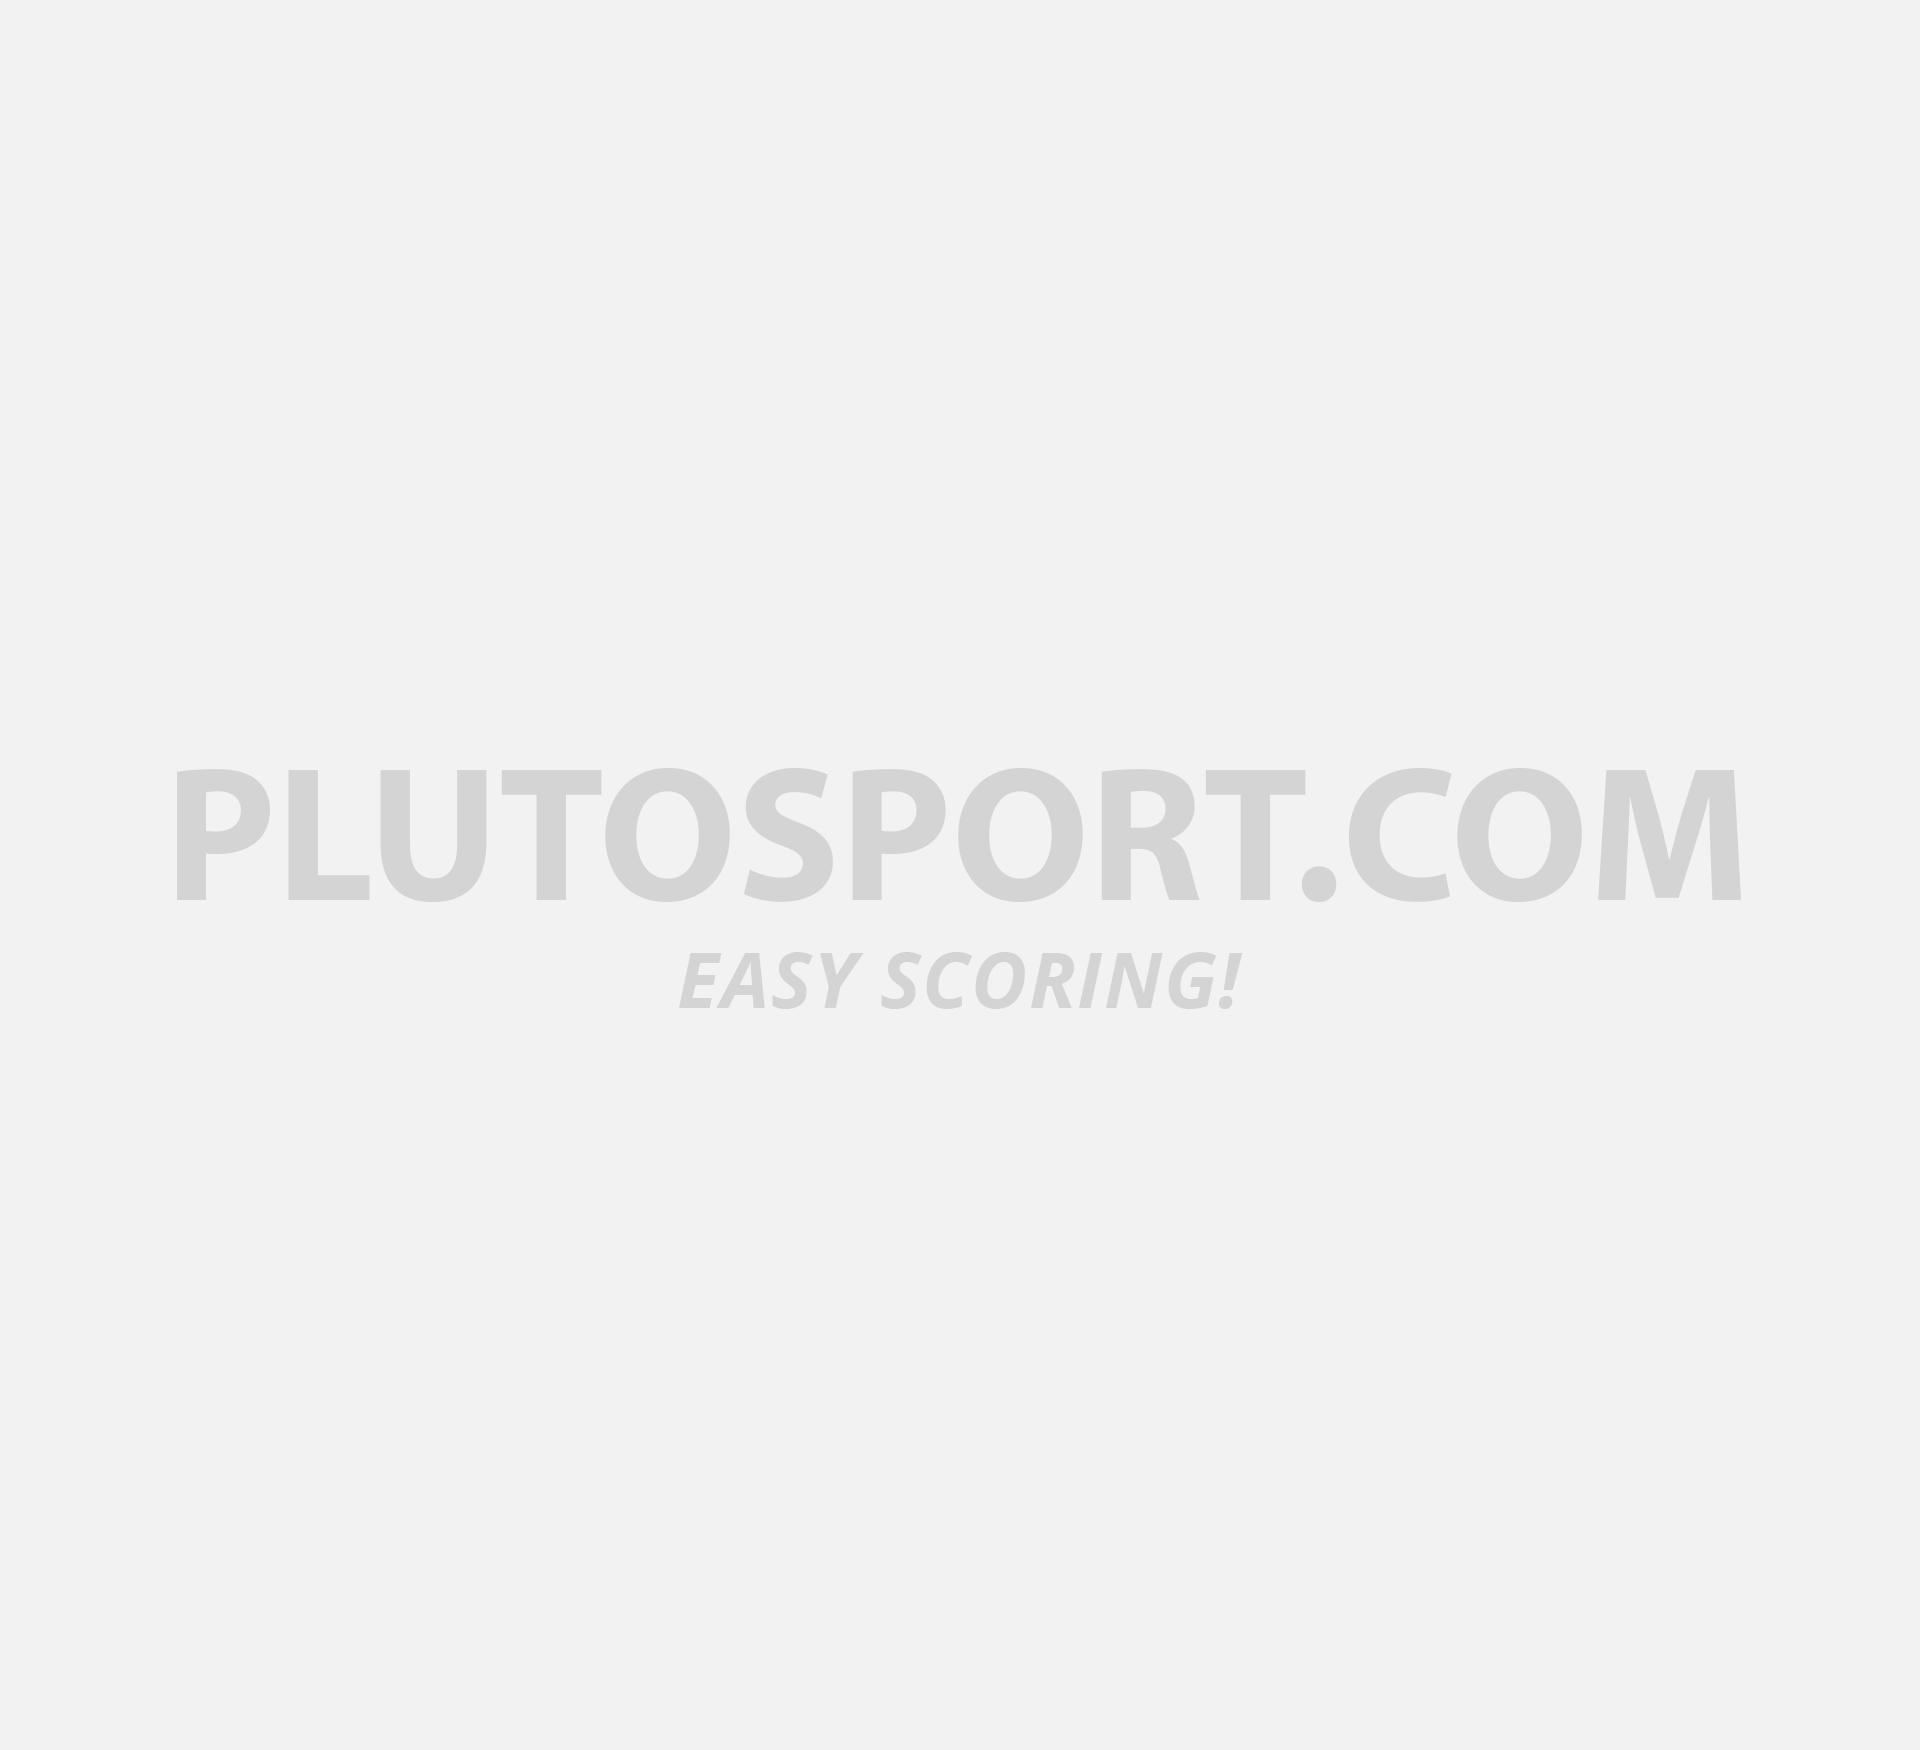 reputable site d088f 2383a Puma FIGC Italia Training Jersey